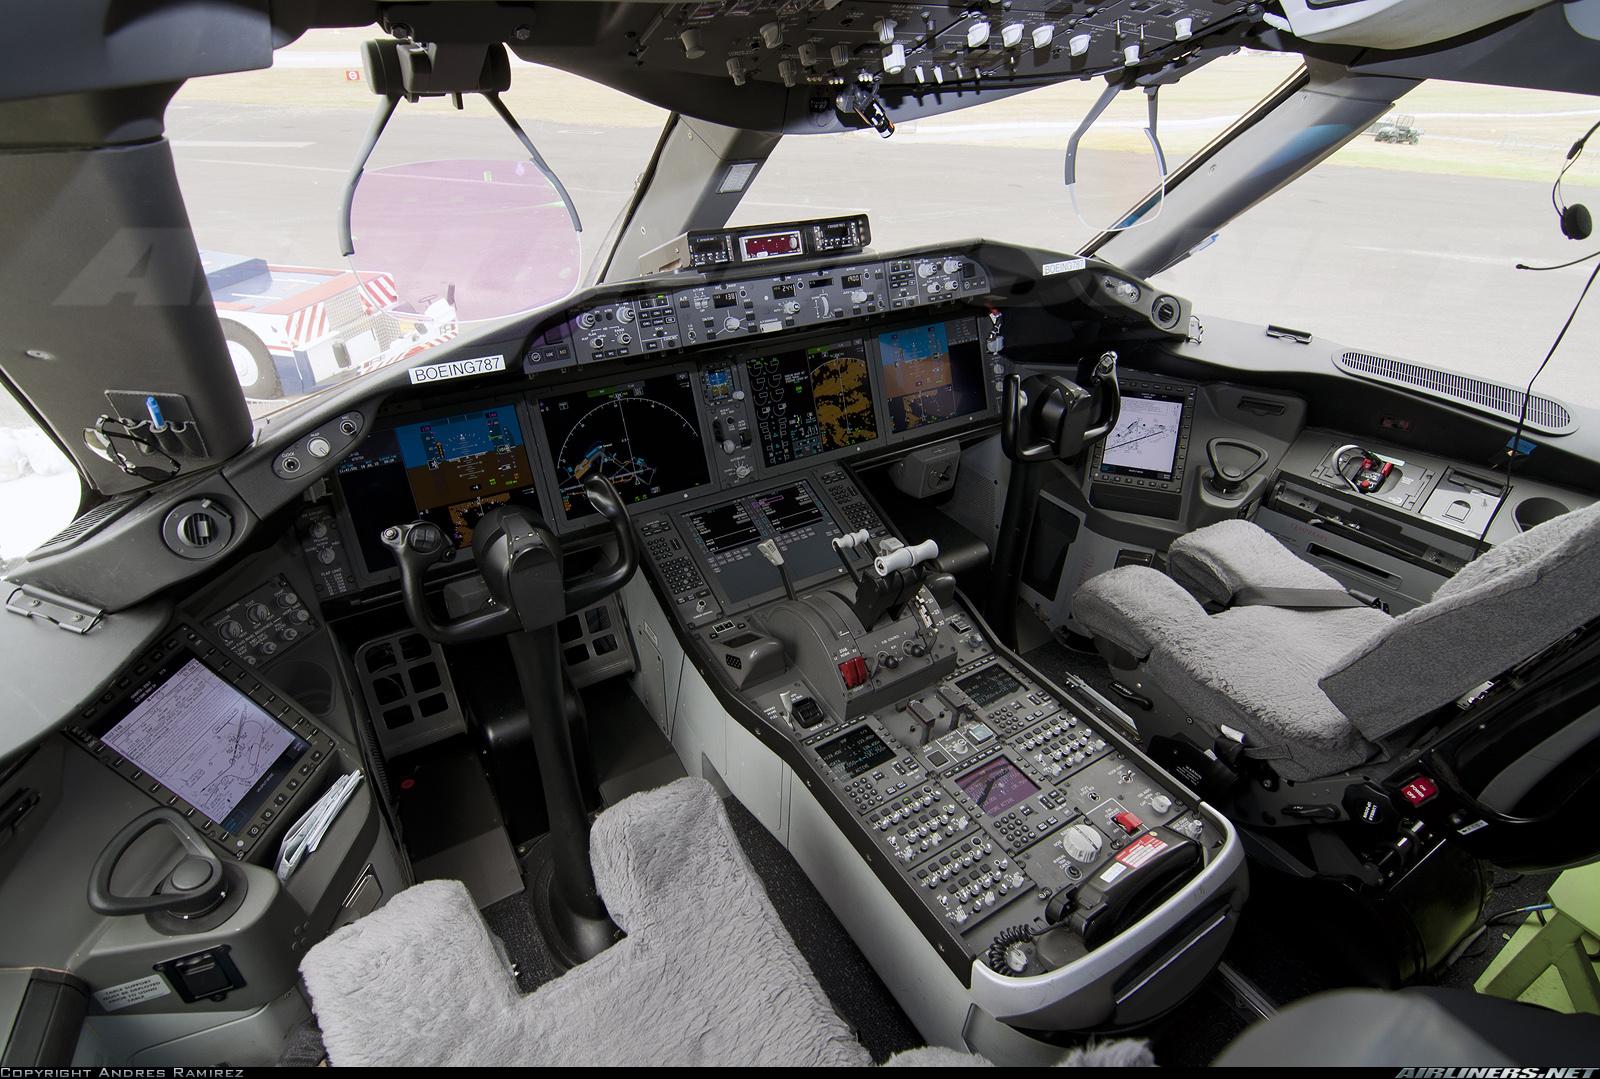 787 dicek works for B b interno 8